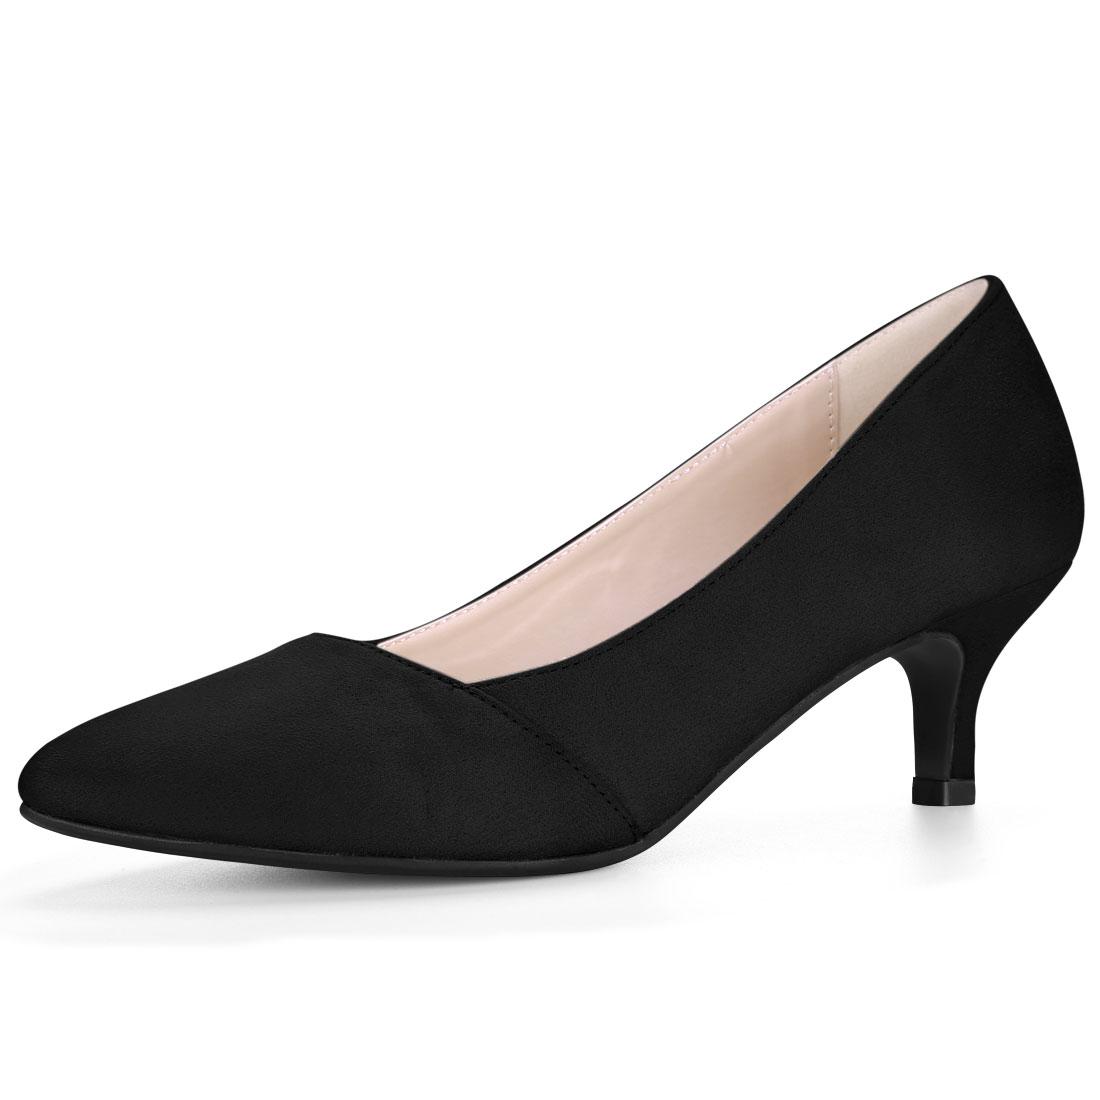 Women Pointed Toe Mid Stiletto Heel Pumps Black US 7